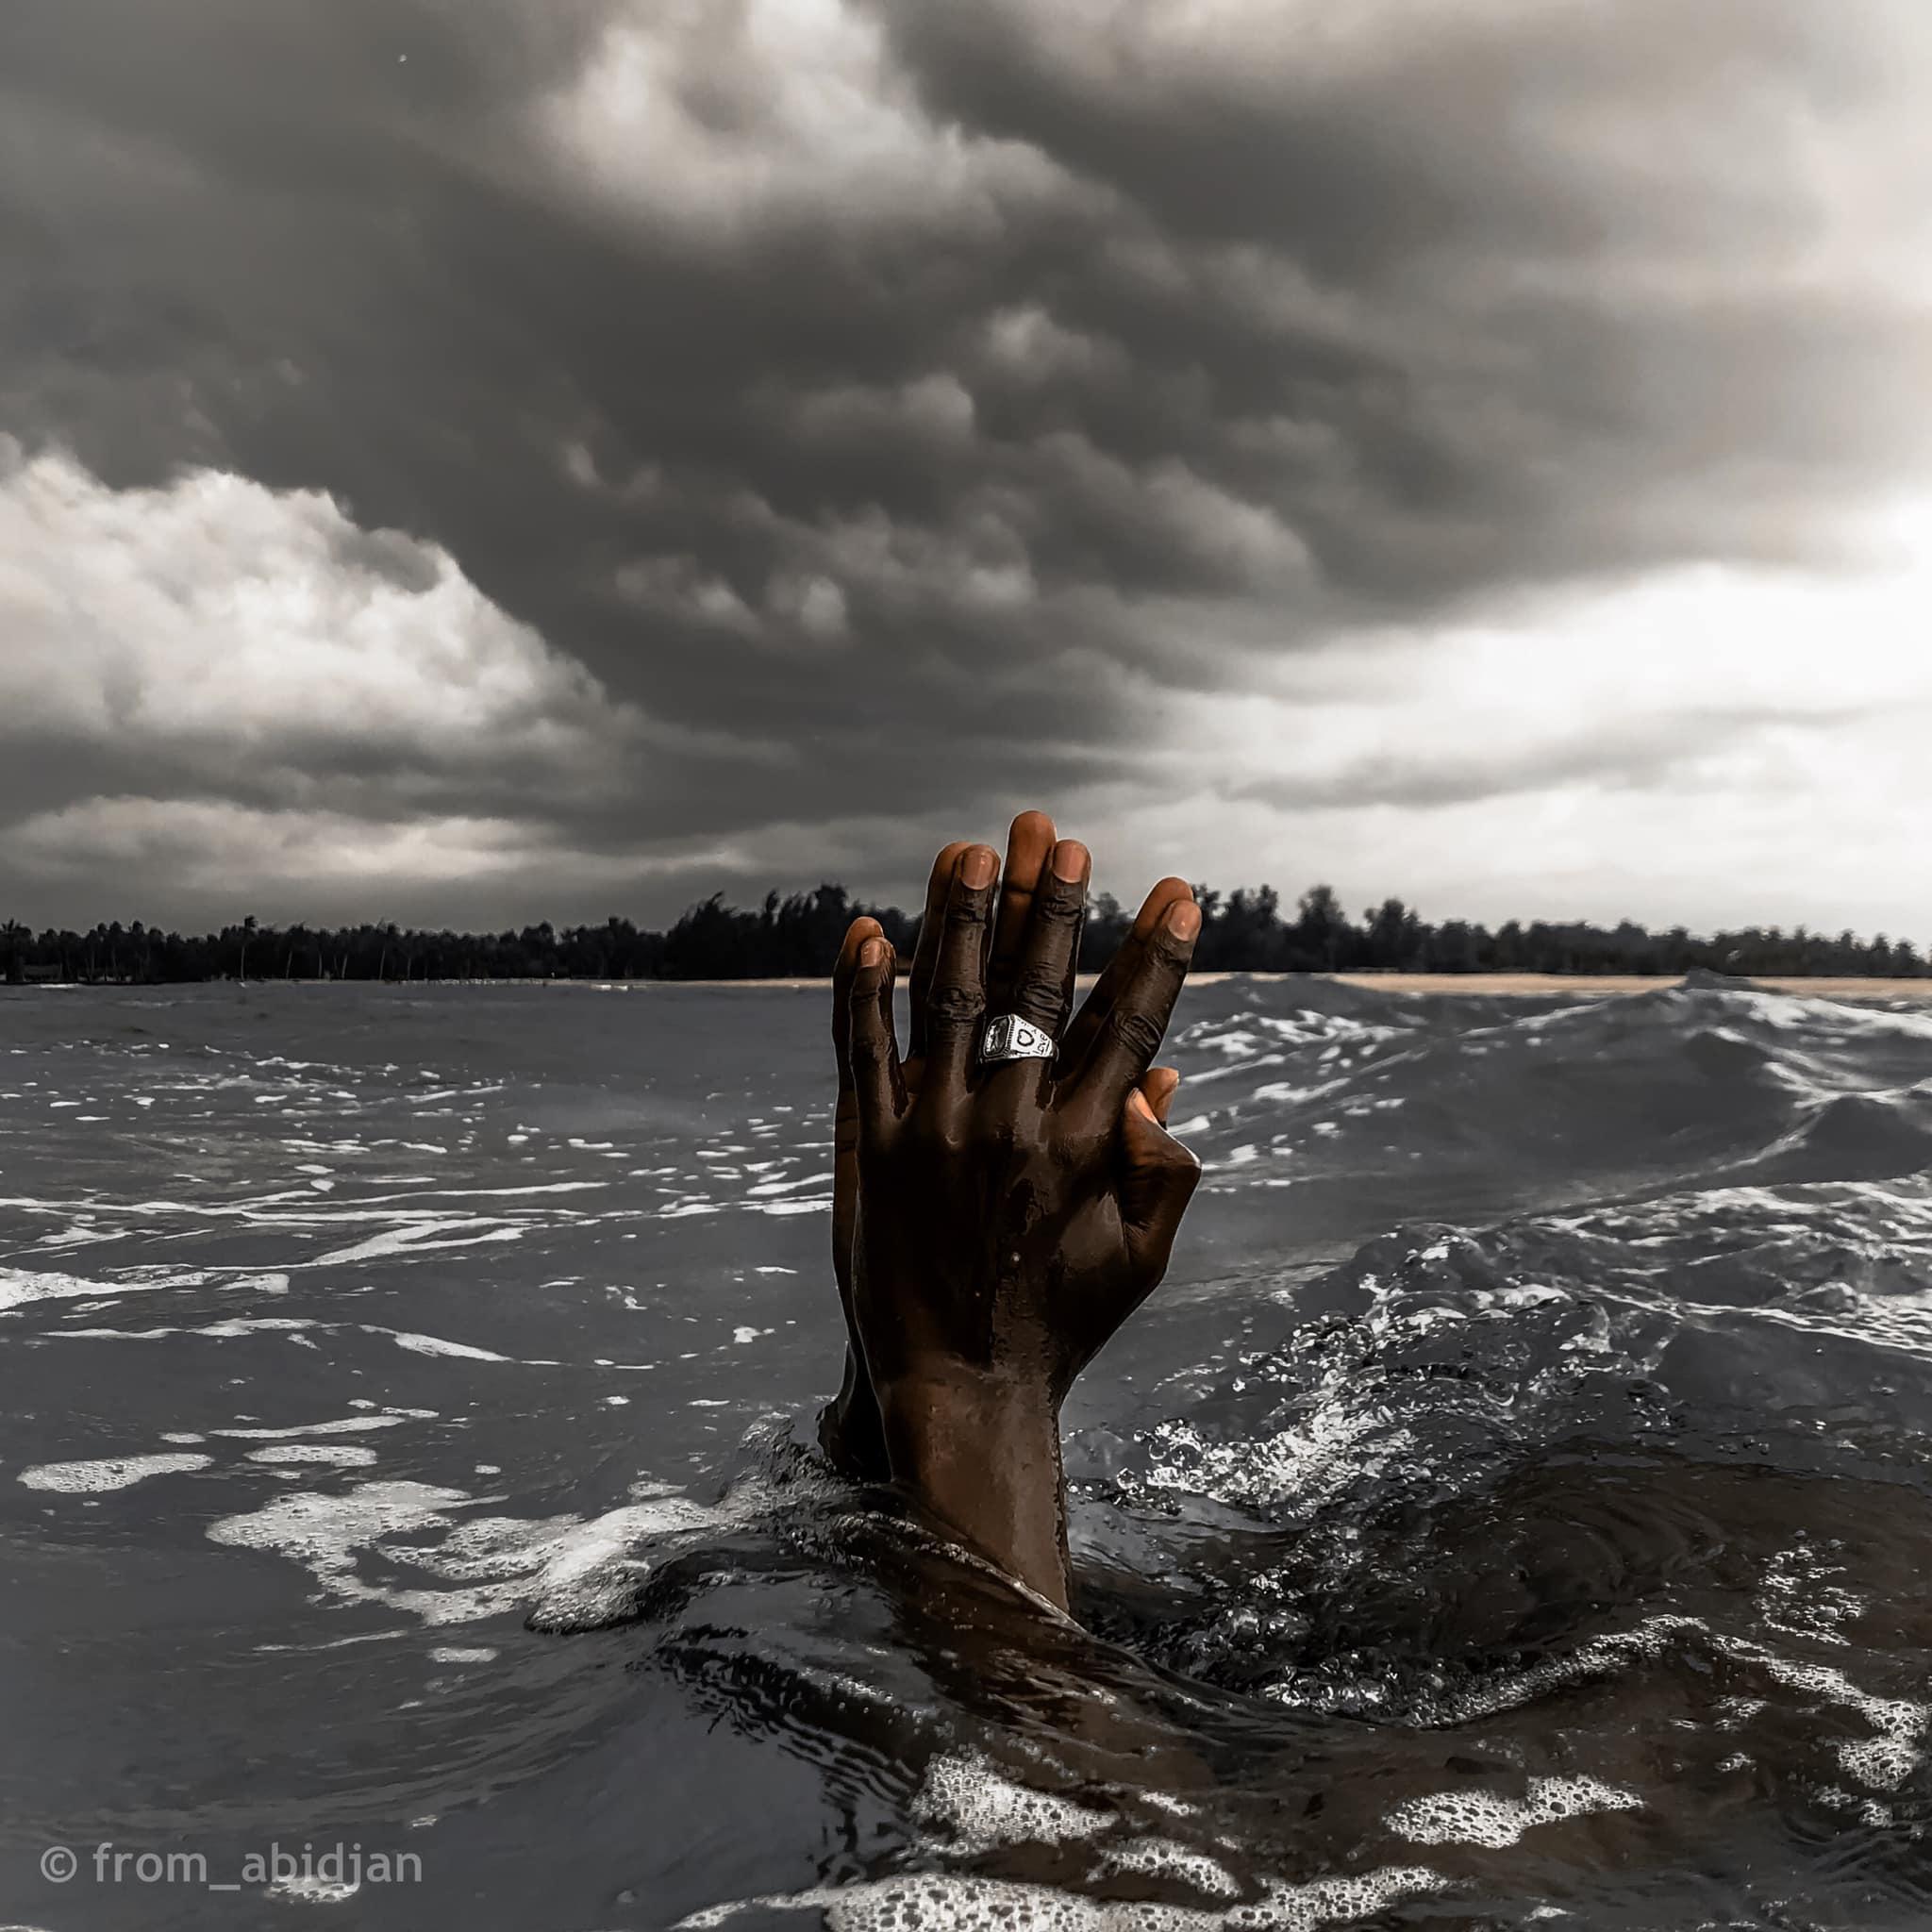 from_abidjan - malick-kebe-photographe-talents-africains-irawotalents-1